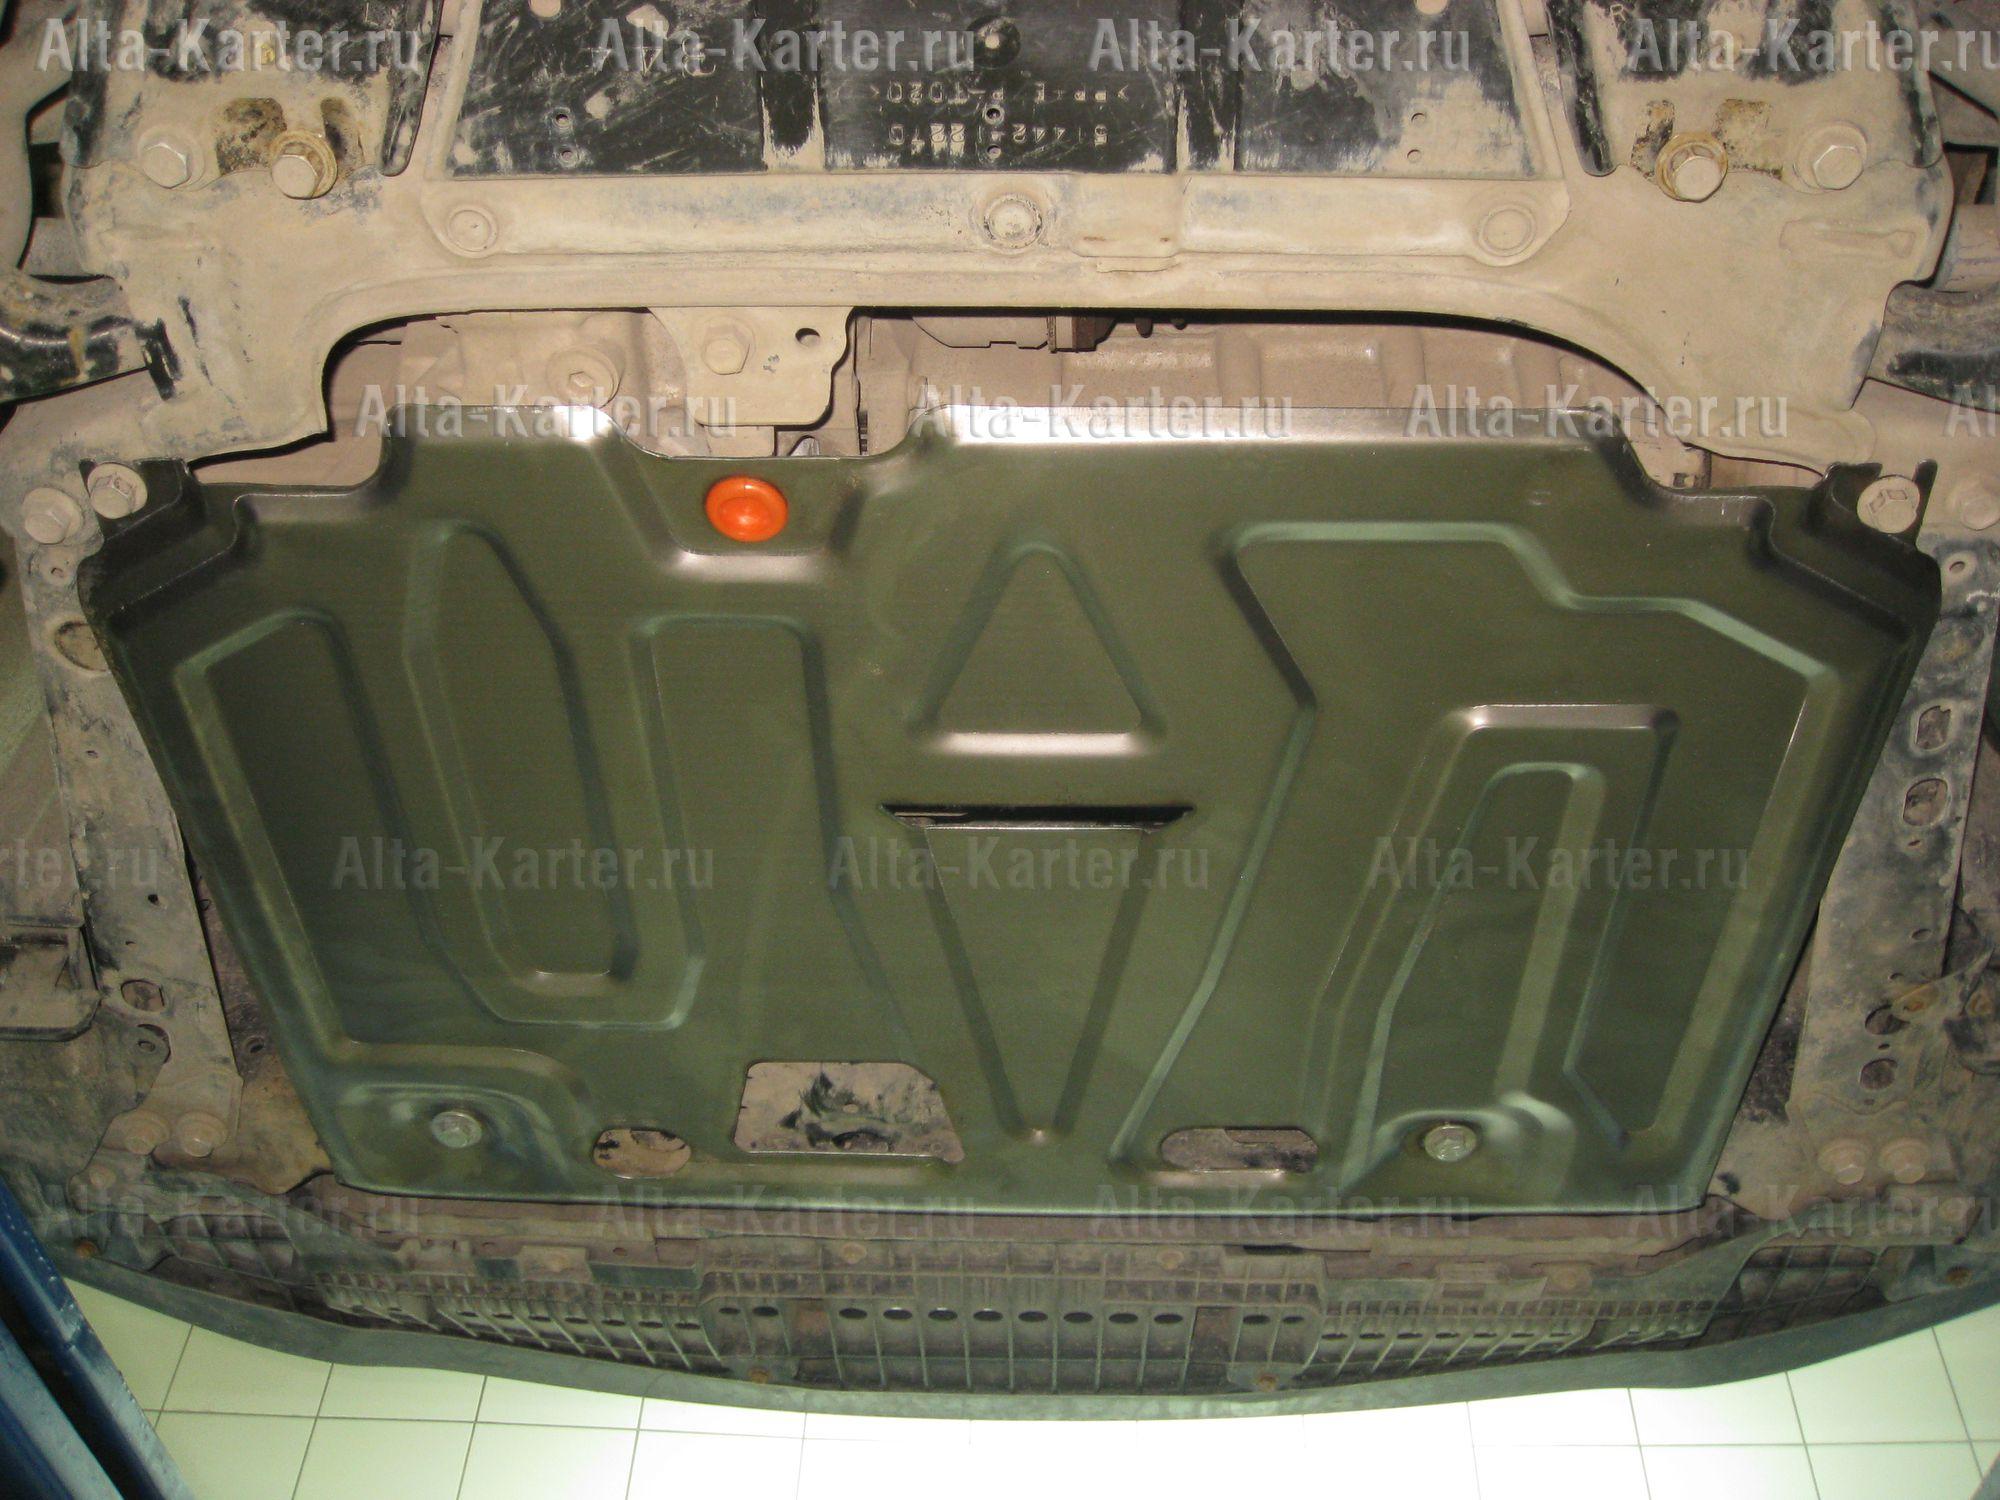 Защита Alfeco для картера и КПП Toyota Verso 2009-2018. Артикул ALF.24.750